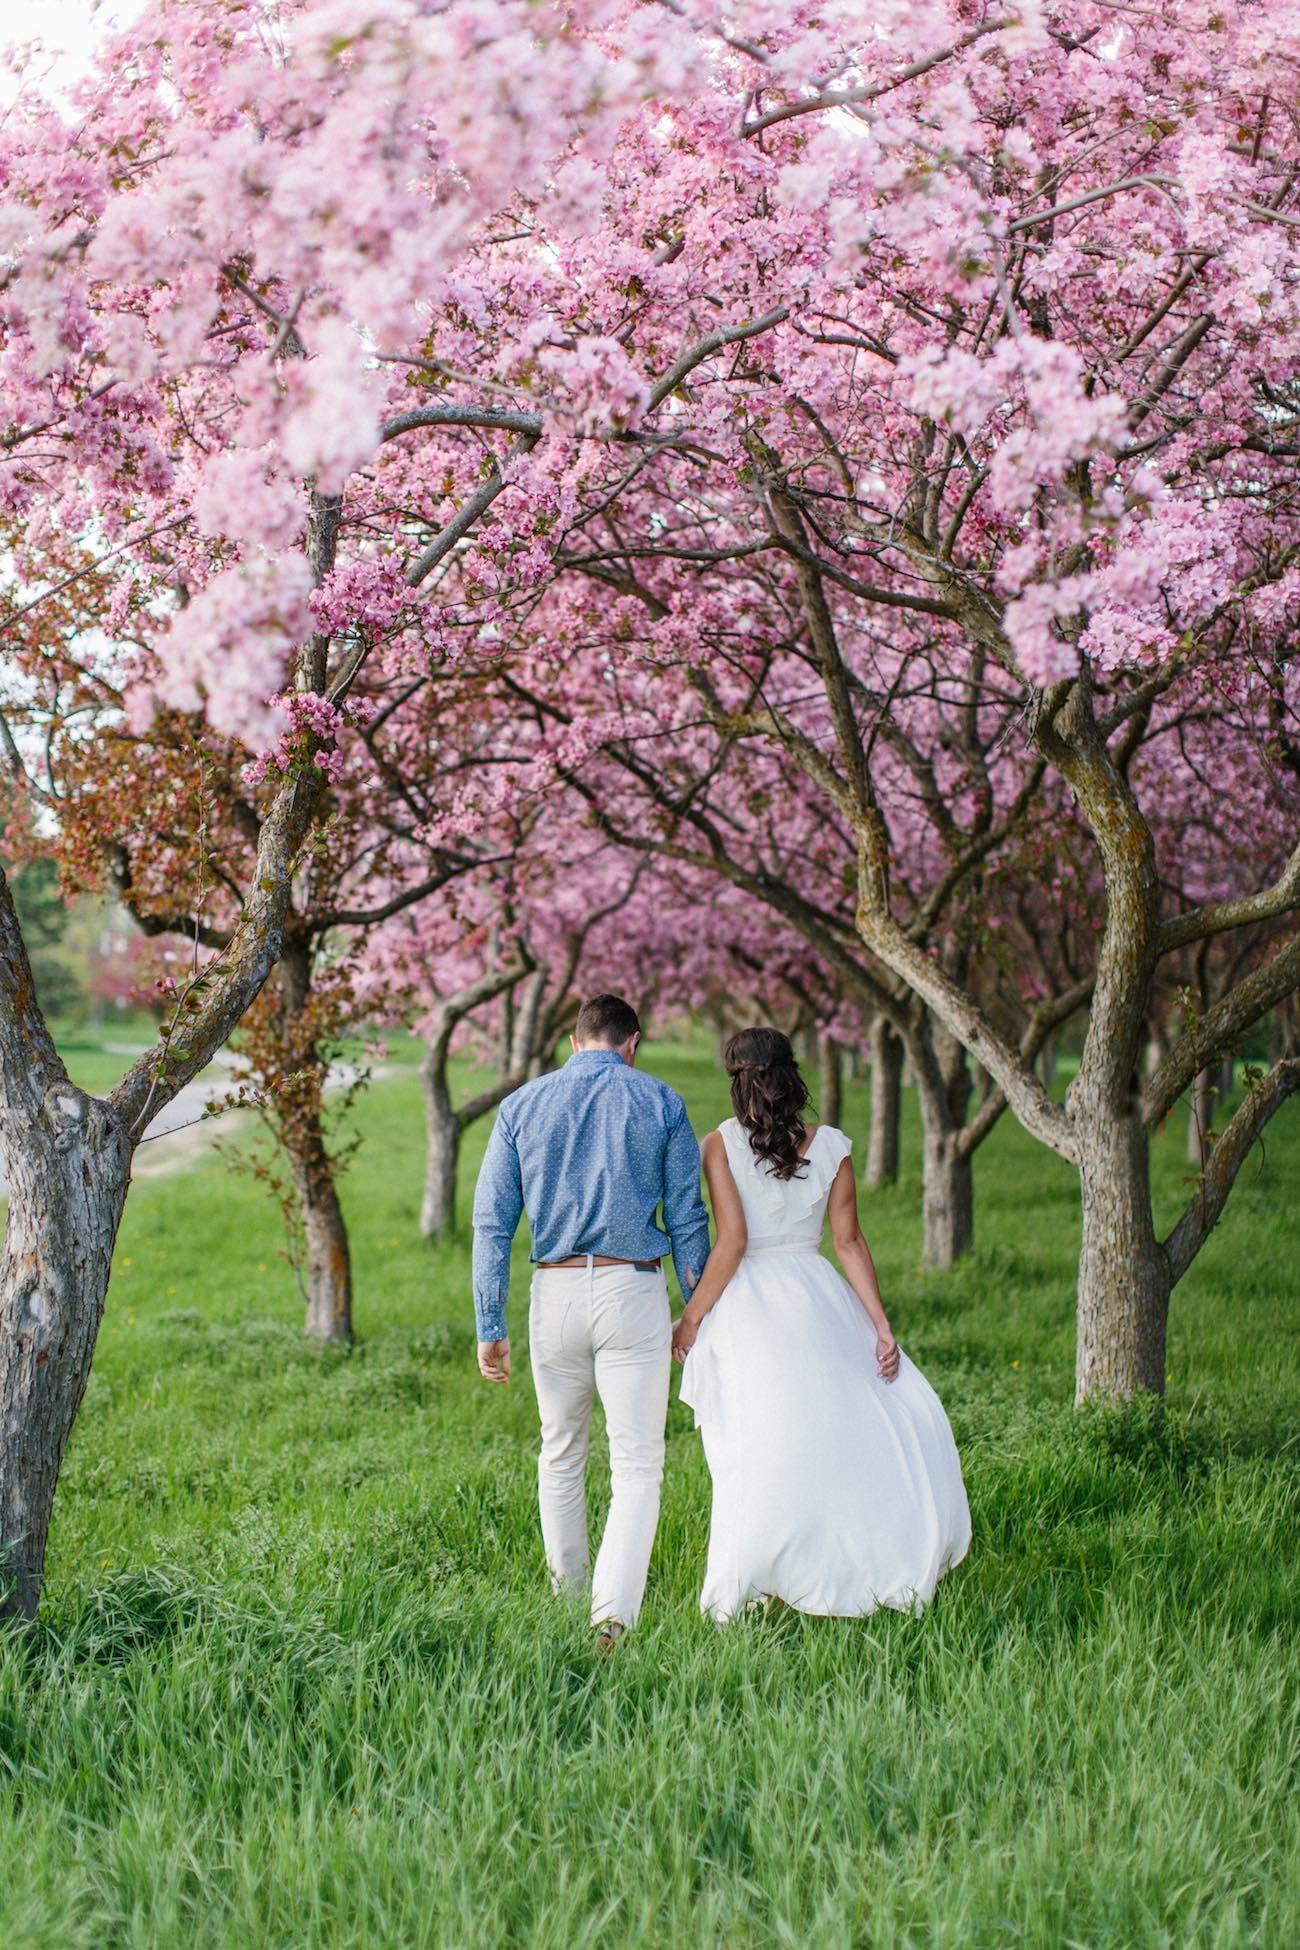 Sweet Apple Blossom Engagement Photographs In Ottawa Grace Gold Studio Engagement Photographer Apple Blossom Spring Photoshoot